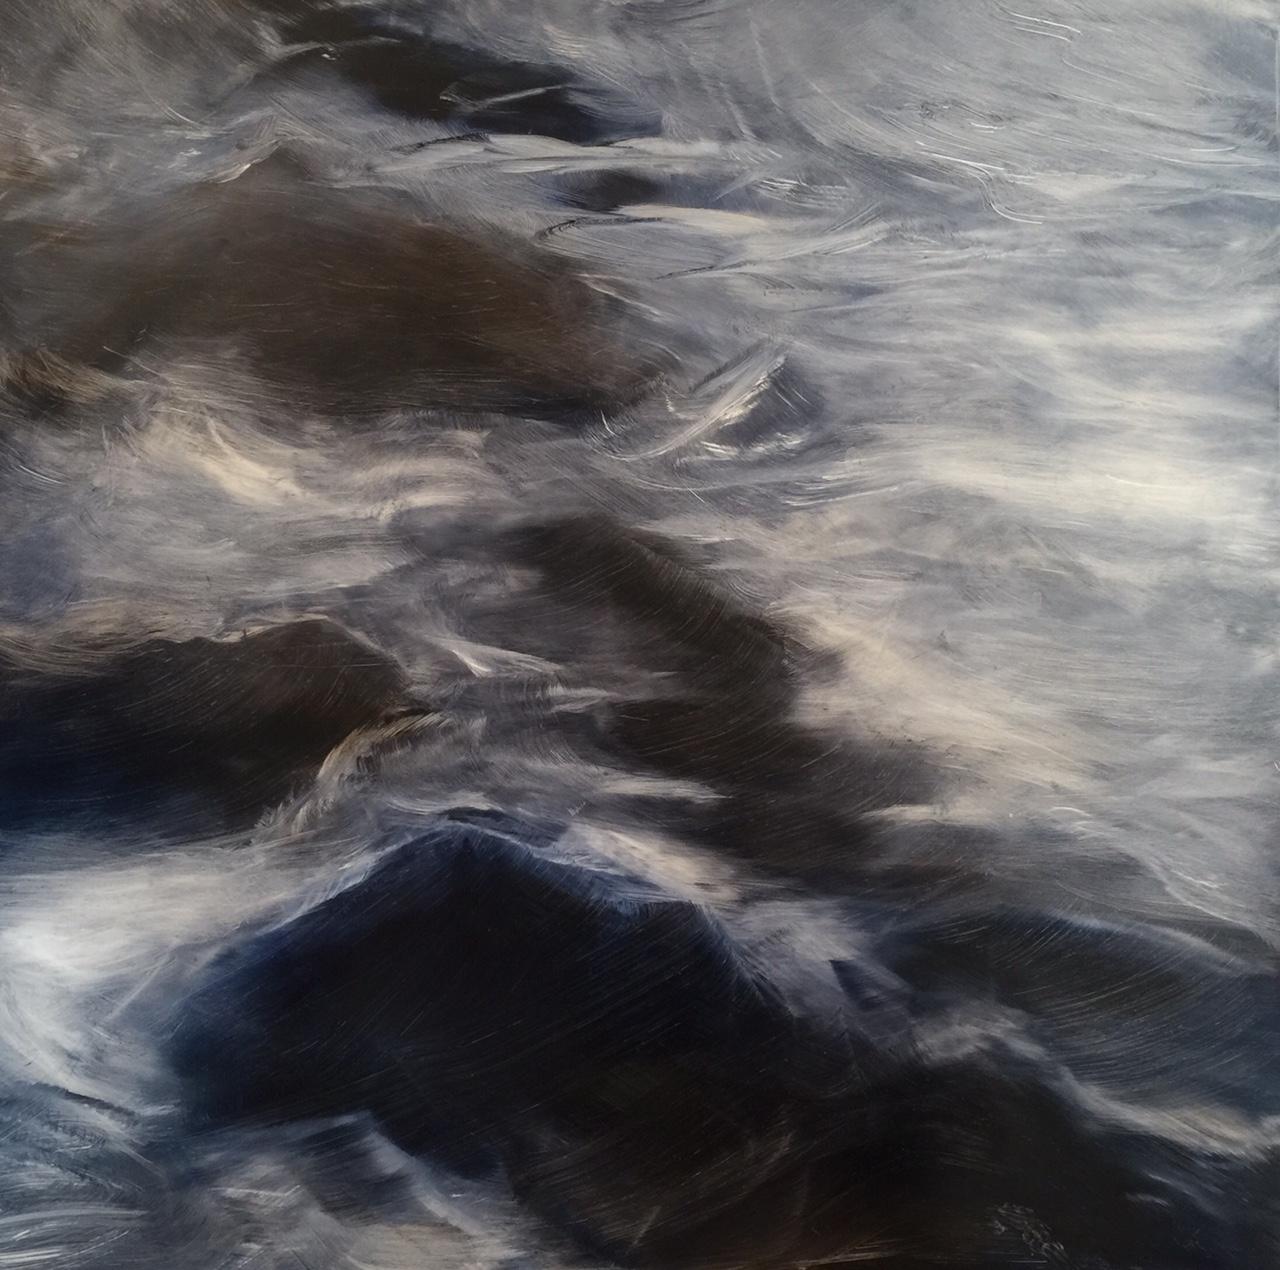 Julliette Tehrani - Stormy Seas